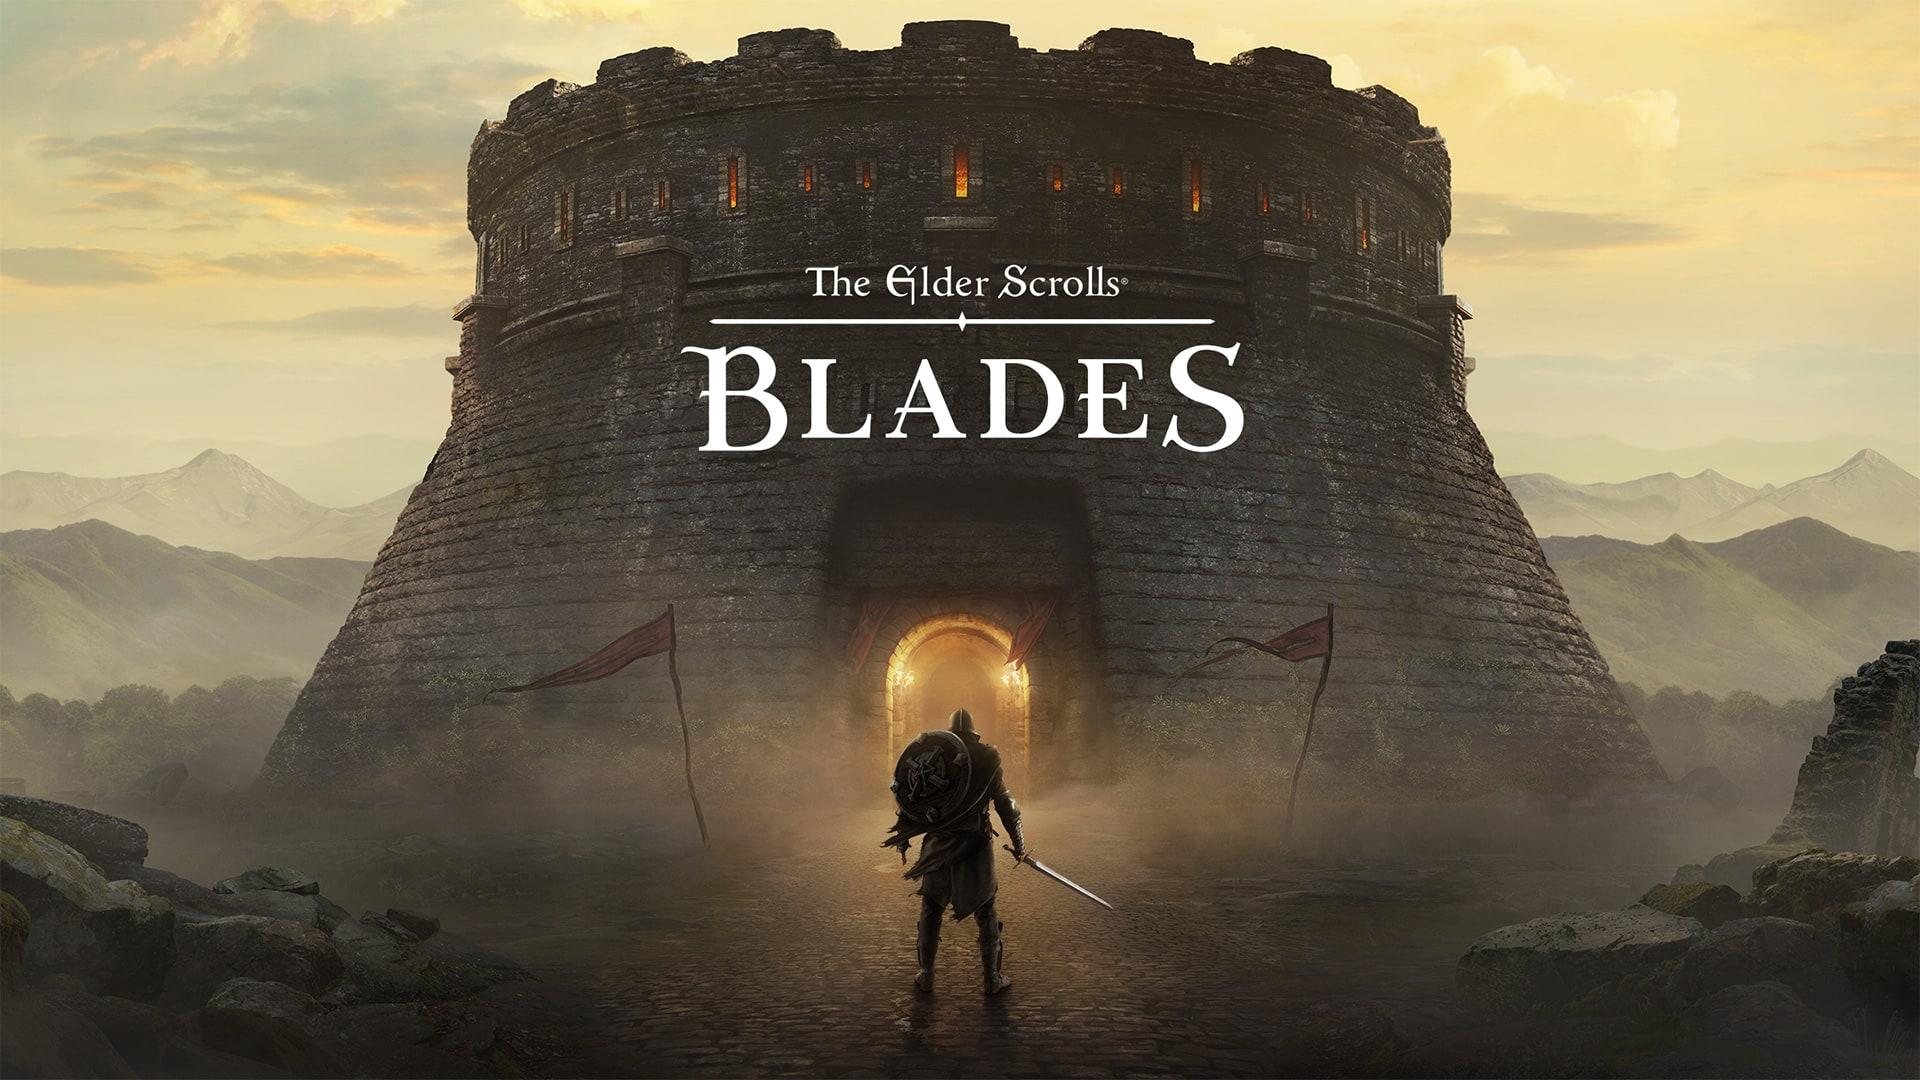 The Elder Scrolls: Blades E3 2019 footage (Switch portable)